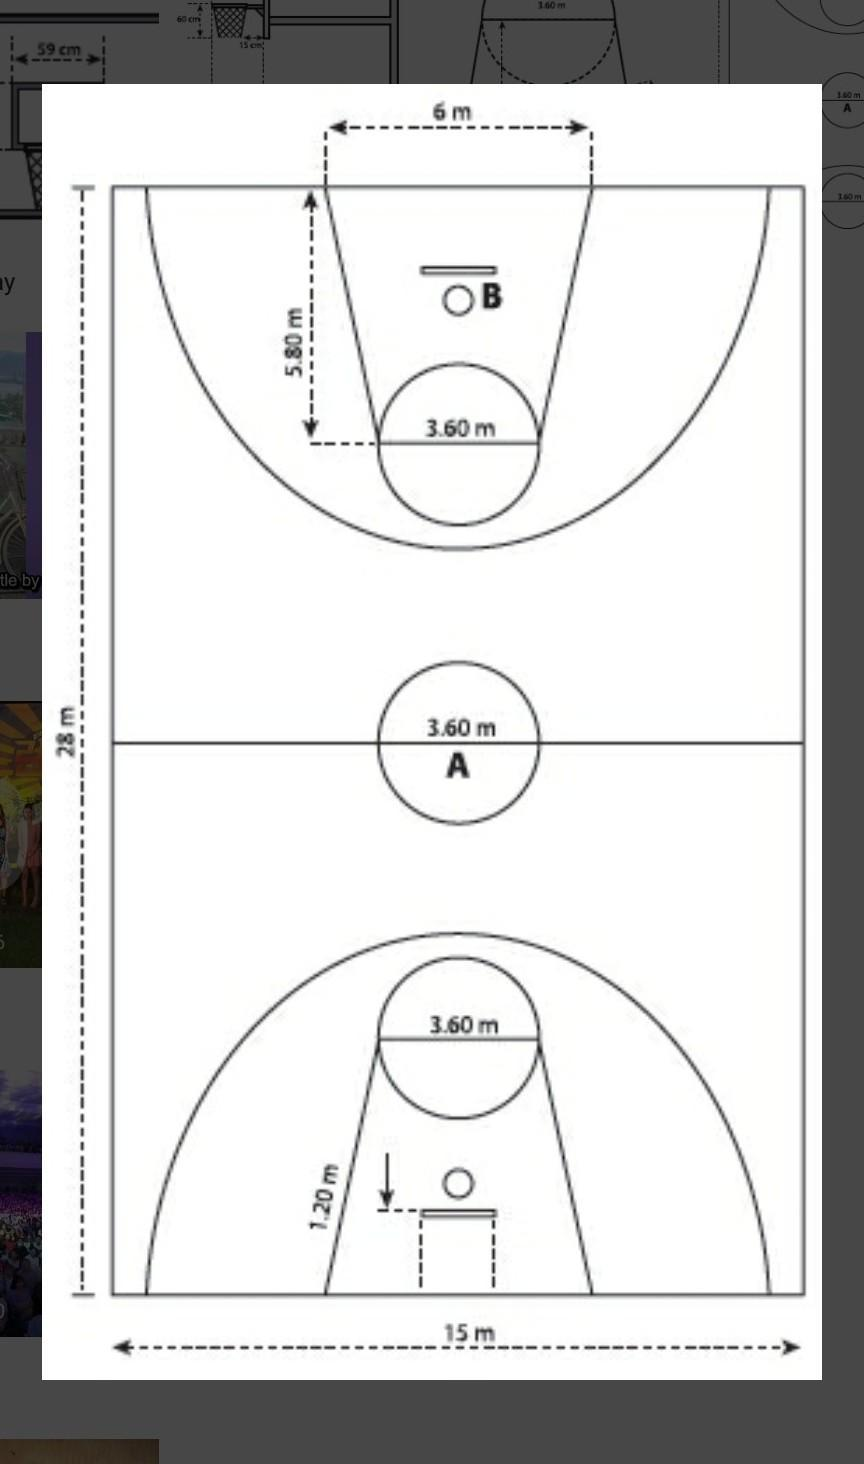 Gambar Lapangan Bola Basket : gambar, lapangan, basket, Pengertian, Permainan, Basket, Serta, Bentuk, Lapangan, Ukuran, Jumlah, Pemain, Tinggi, Keranja, Brainly.co.id